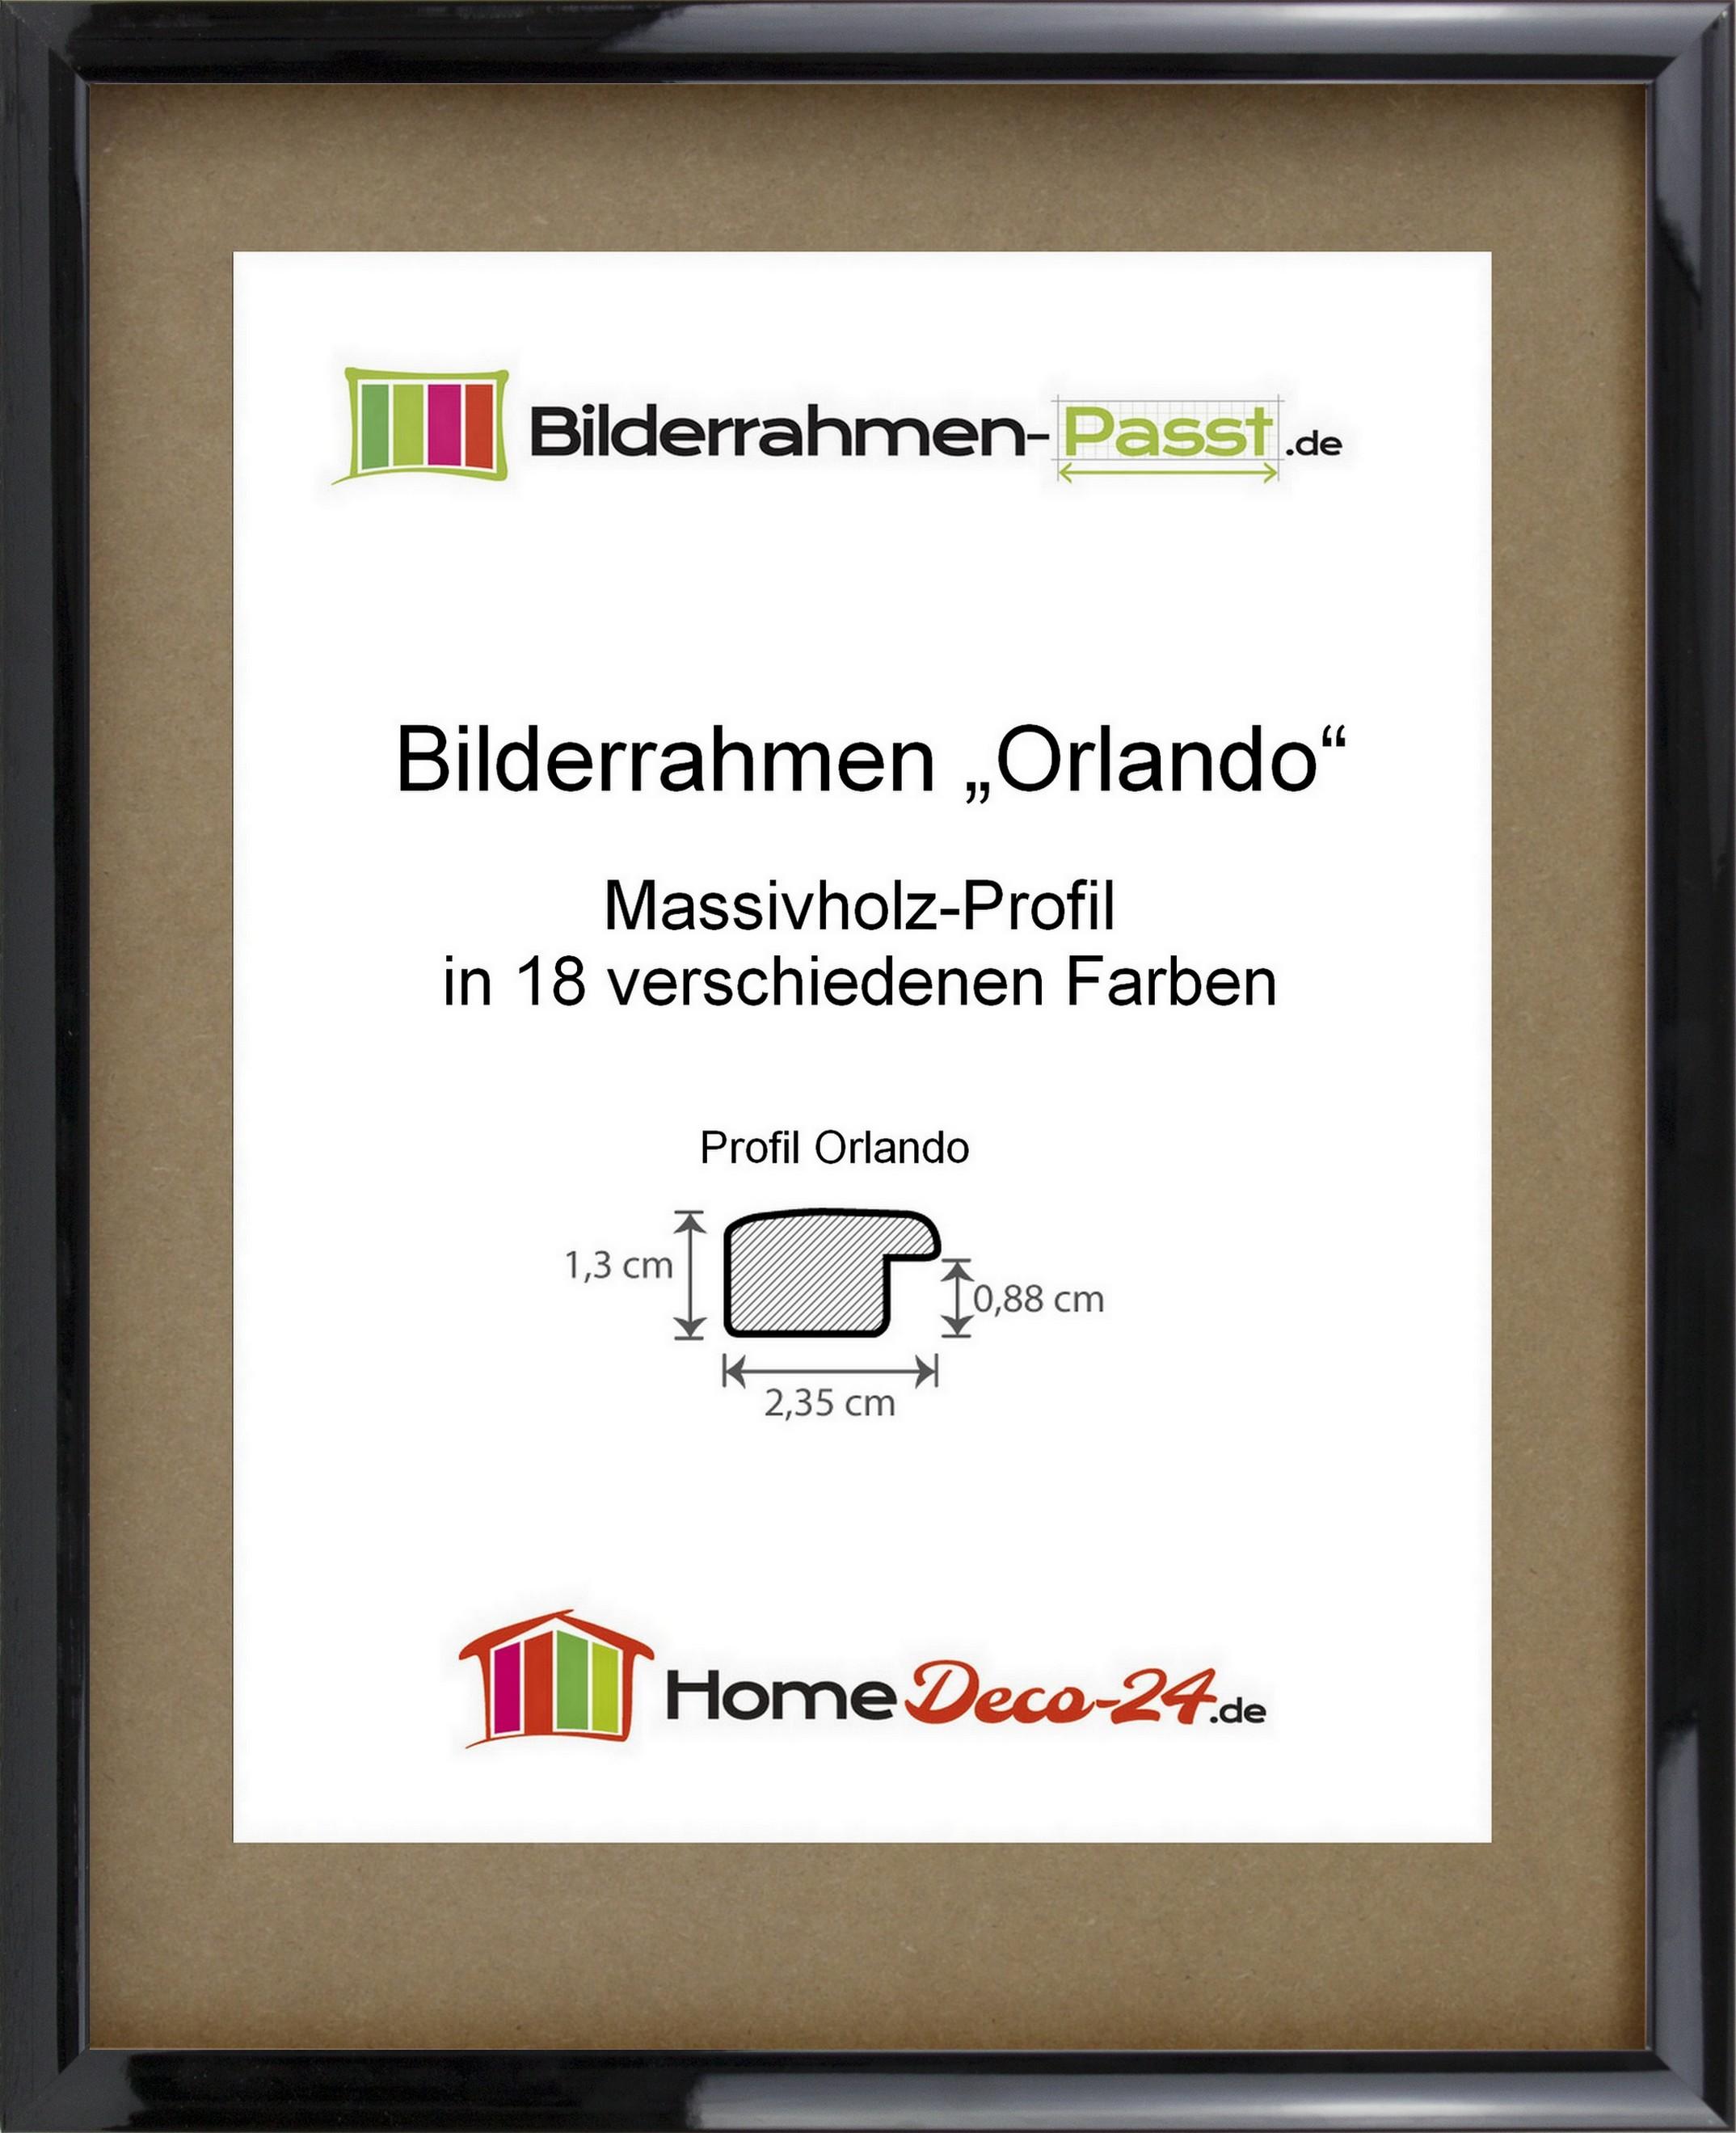 orlando massivholz bilderrahmen farbwahl gr ssenwahl standard gr ssen a neu ebay. Black Bedroom Furniture Sets. Home Design Ideas